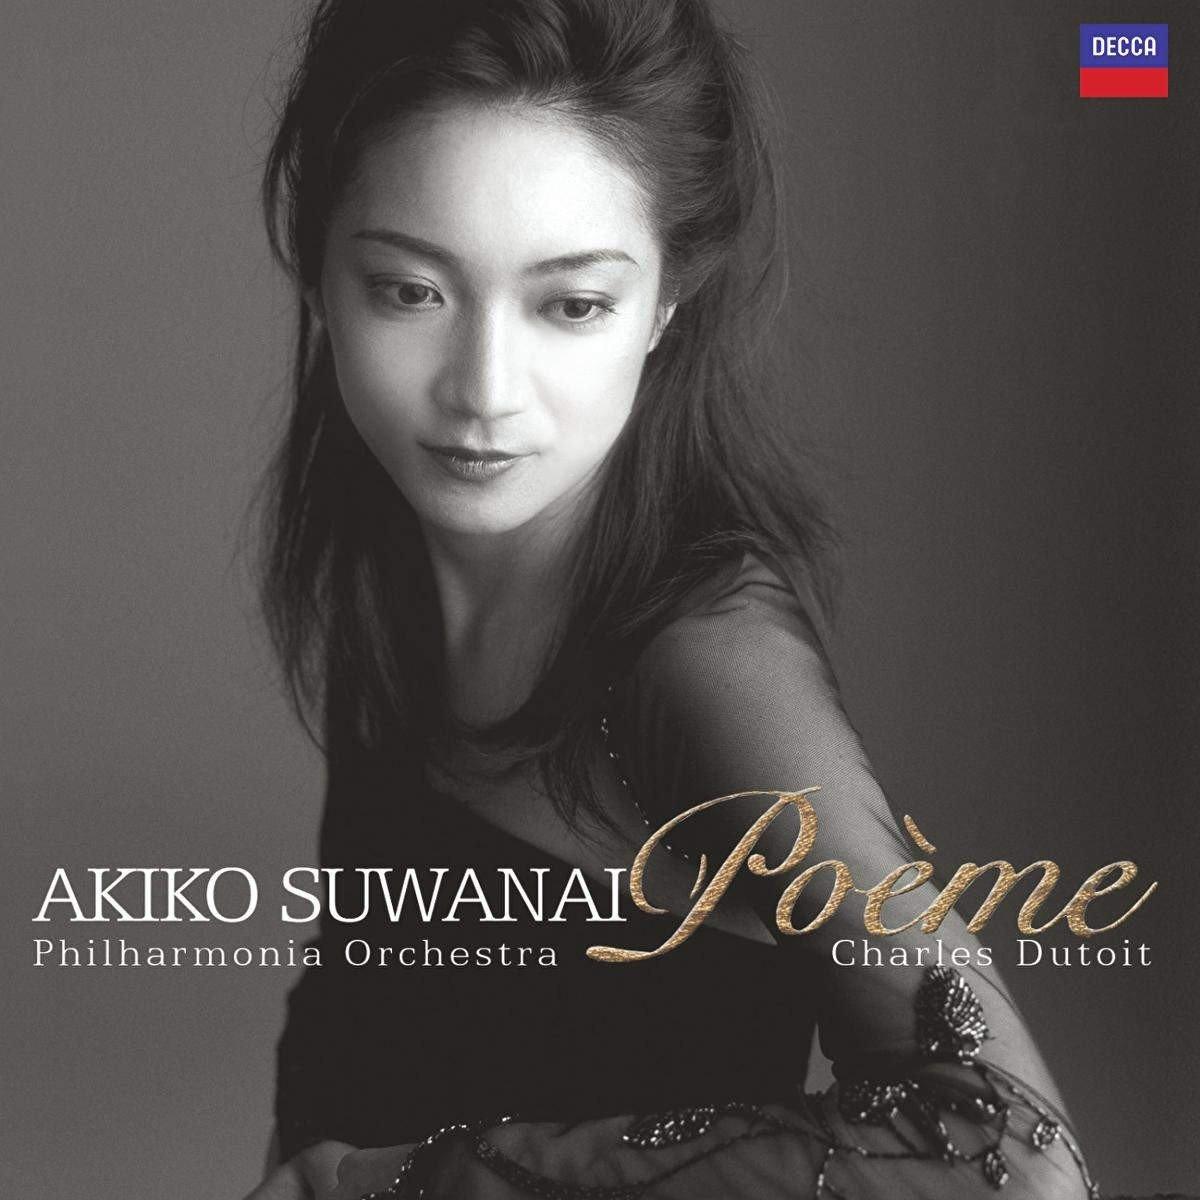 諏訪内晶子 (Akiko Suwanai) – 詩曲 Poeme [e-Onkyo FLAC 24bit/192kHz + SACD DFF]